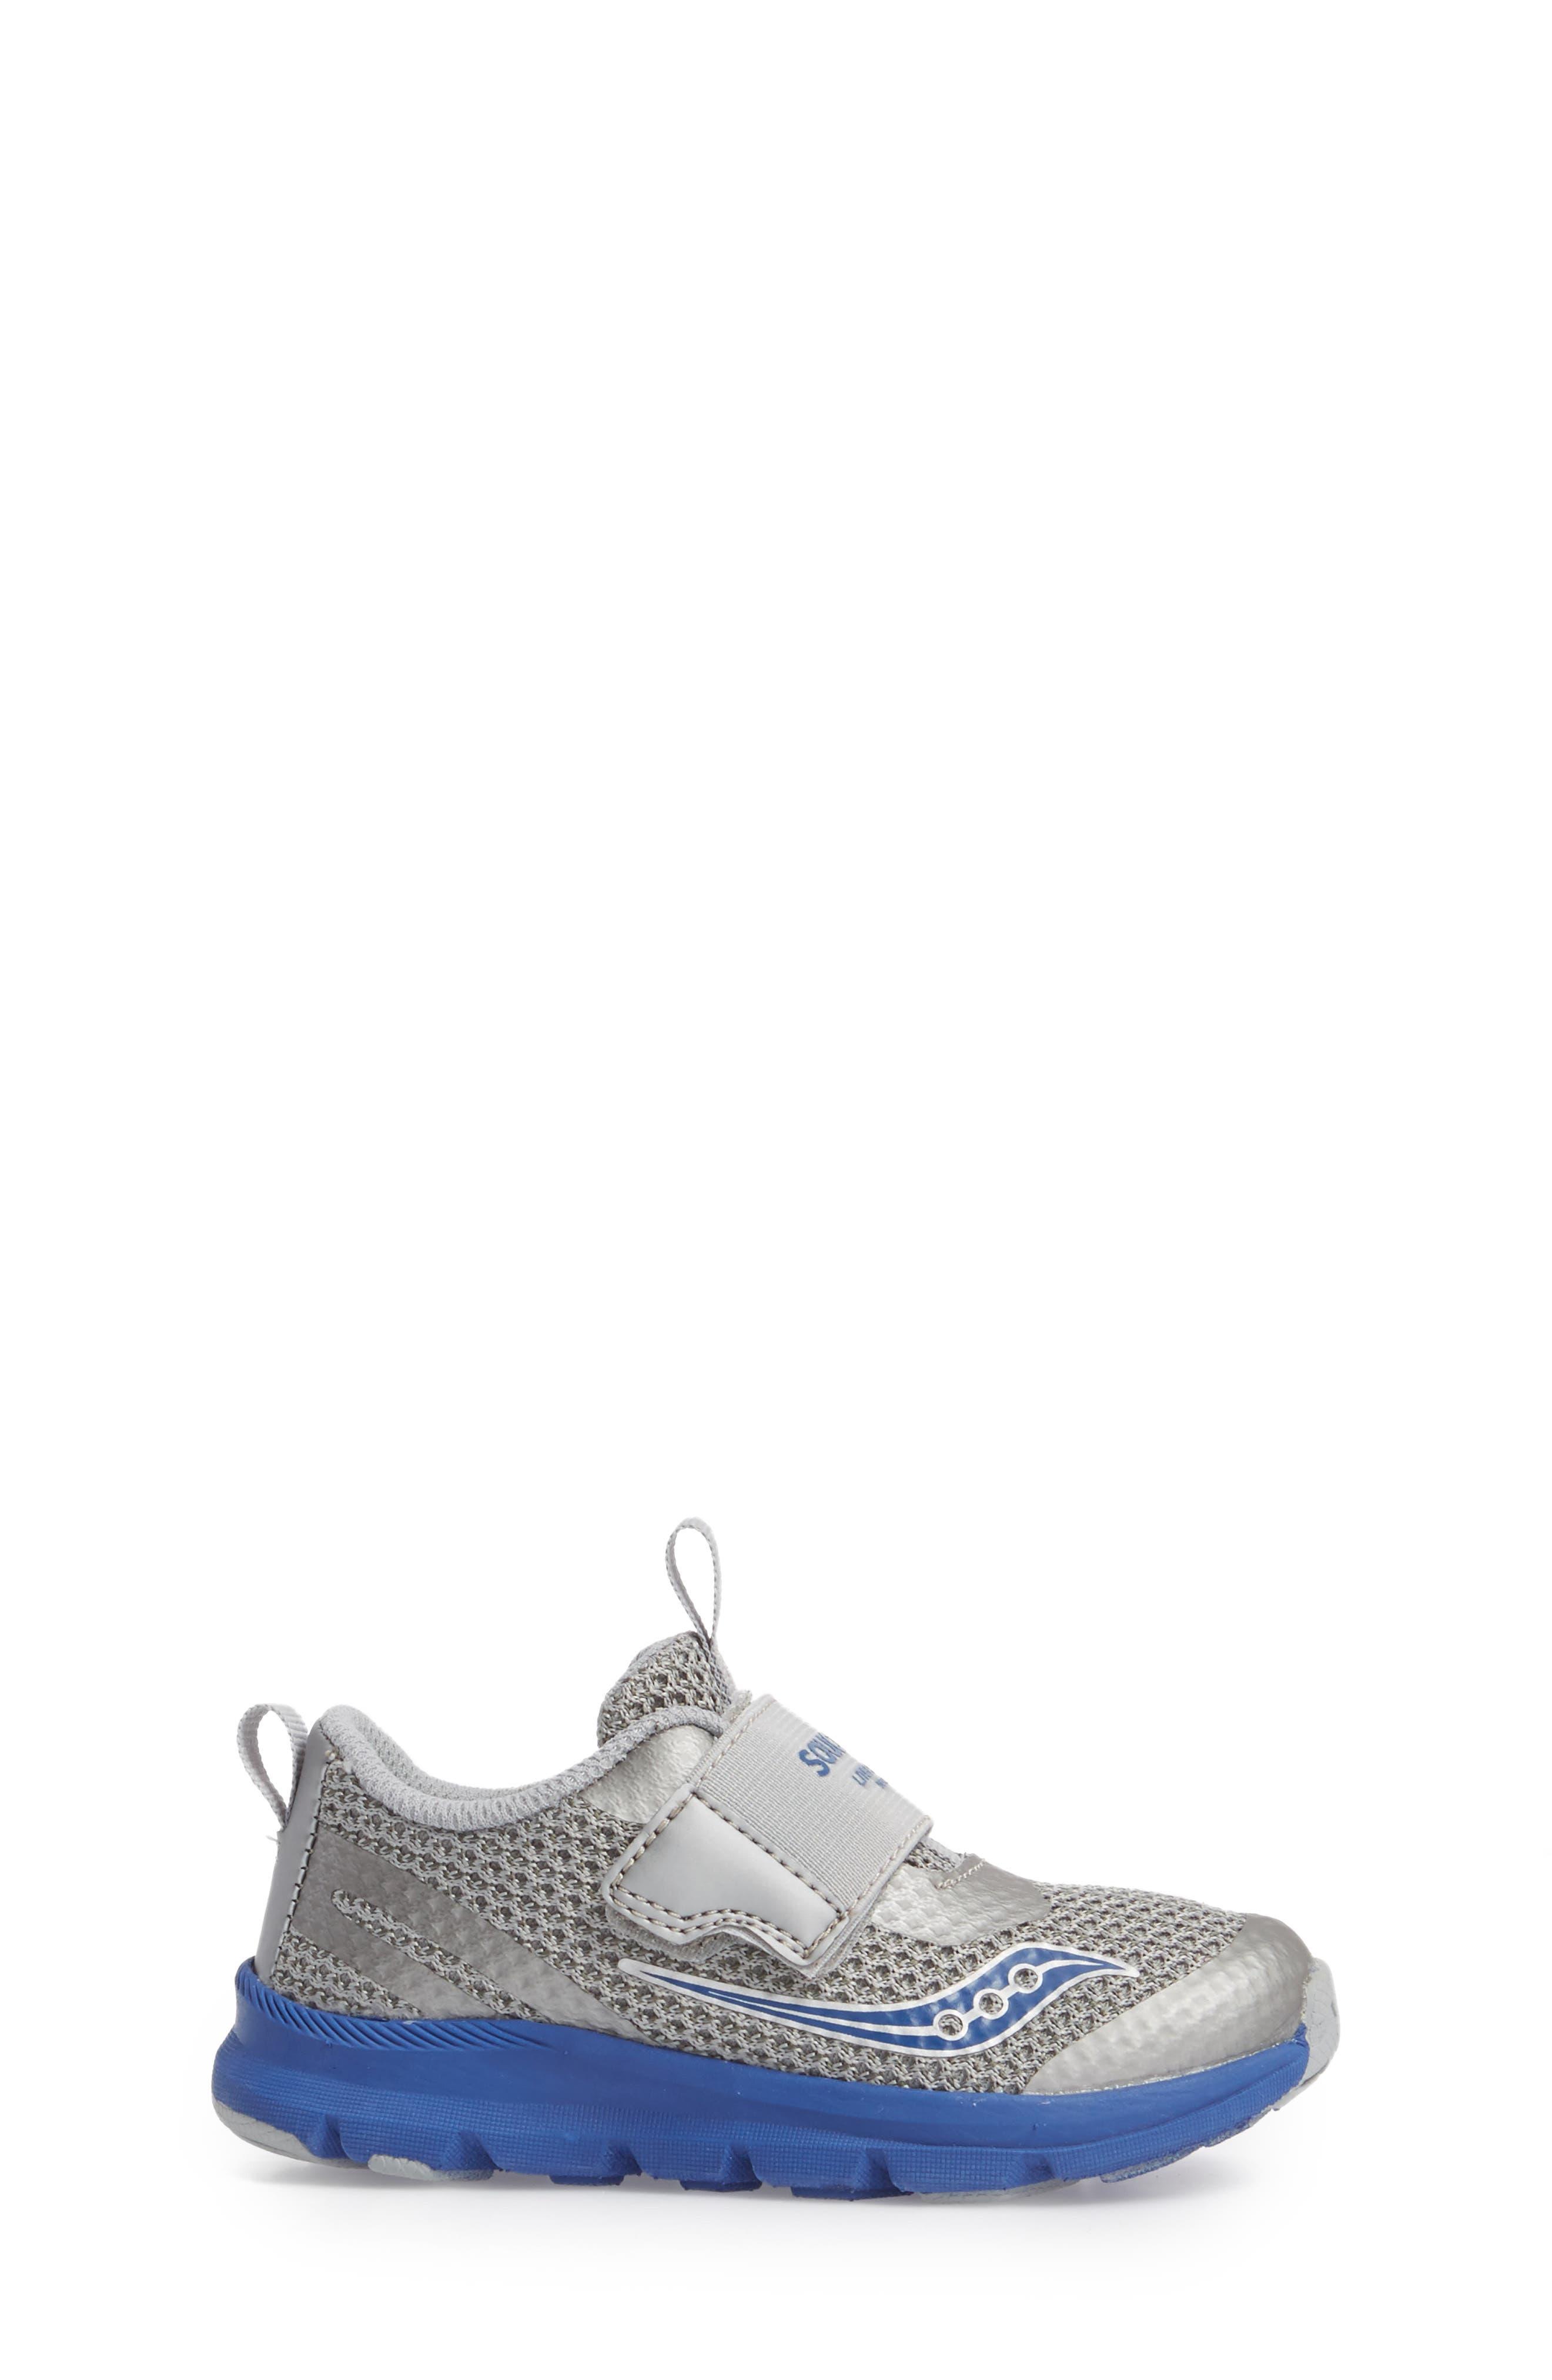 Baby Liteform Sneaker,                             Alternate thumbnail 3, color,                             Grey/ Blue